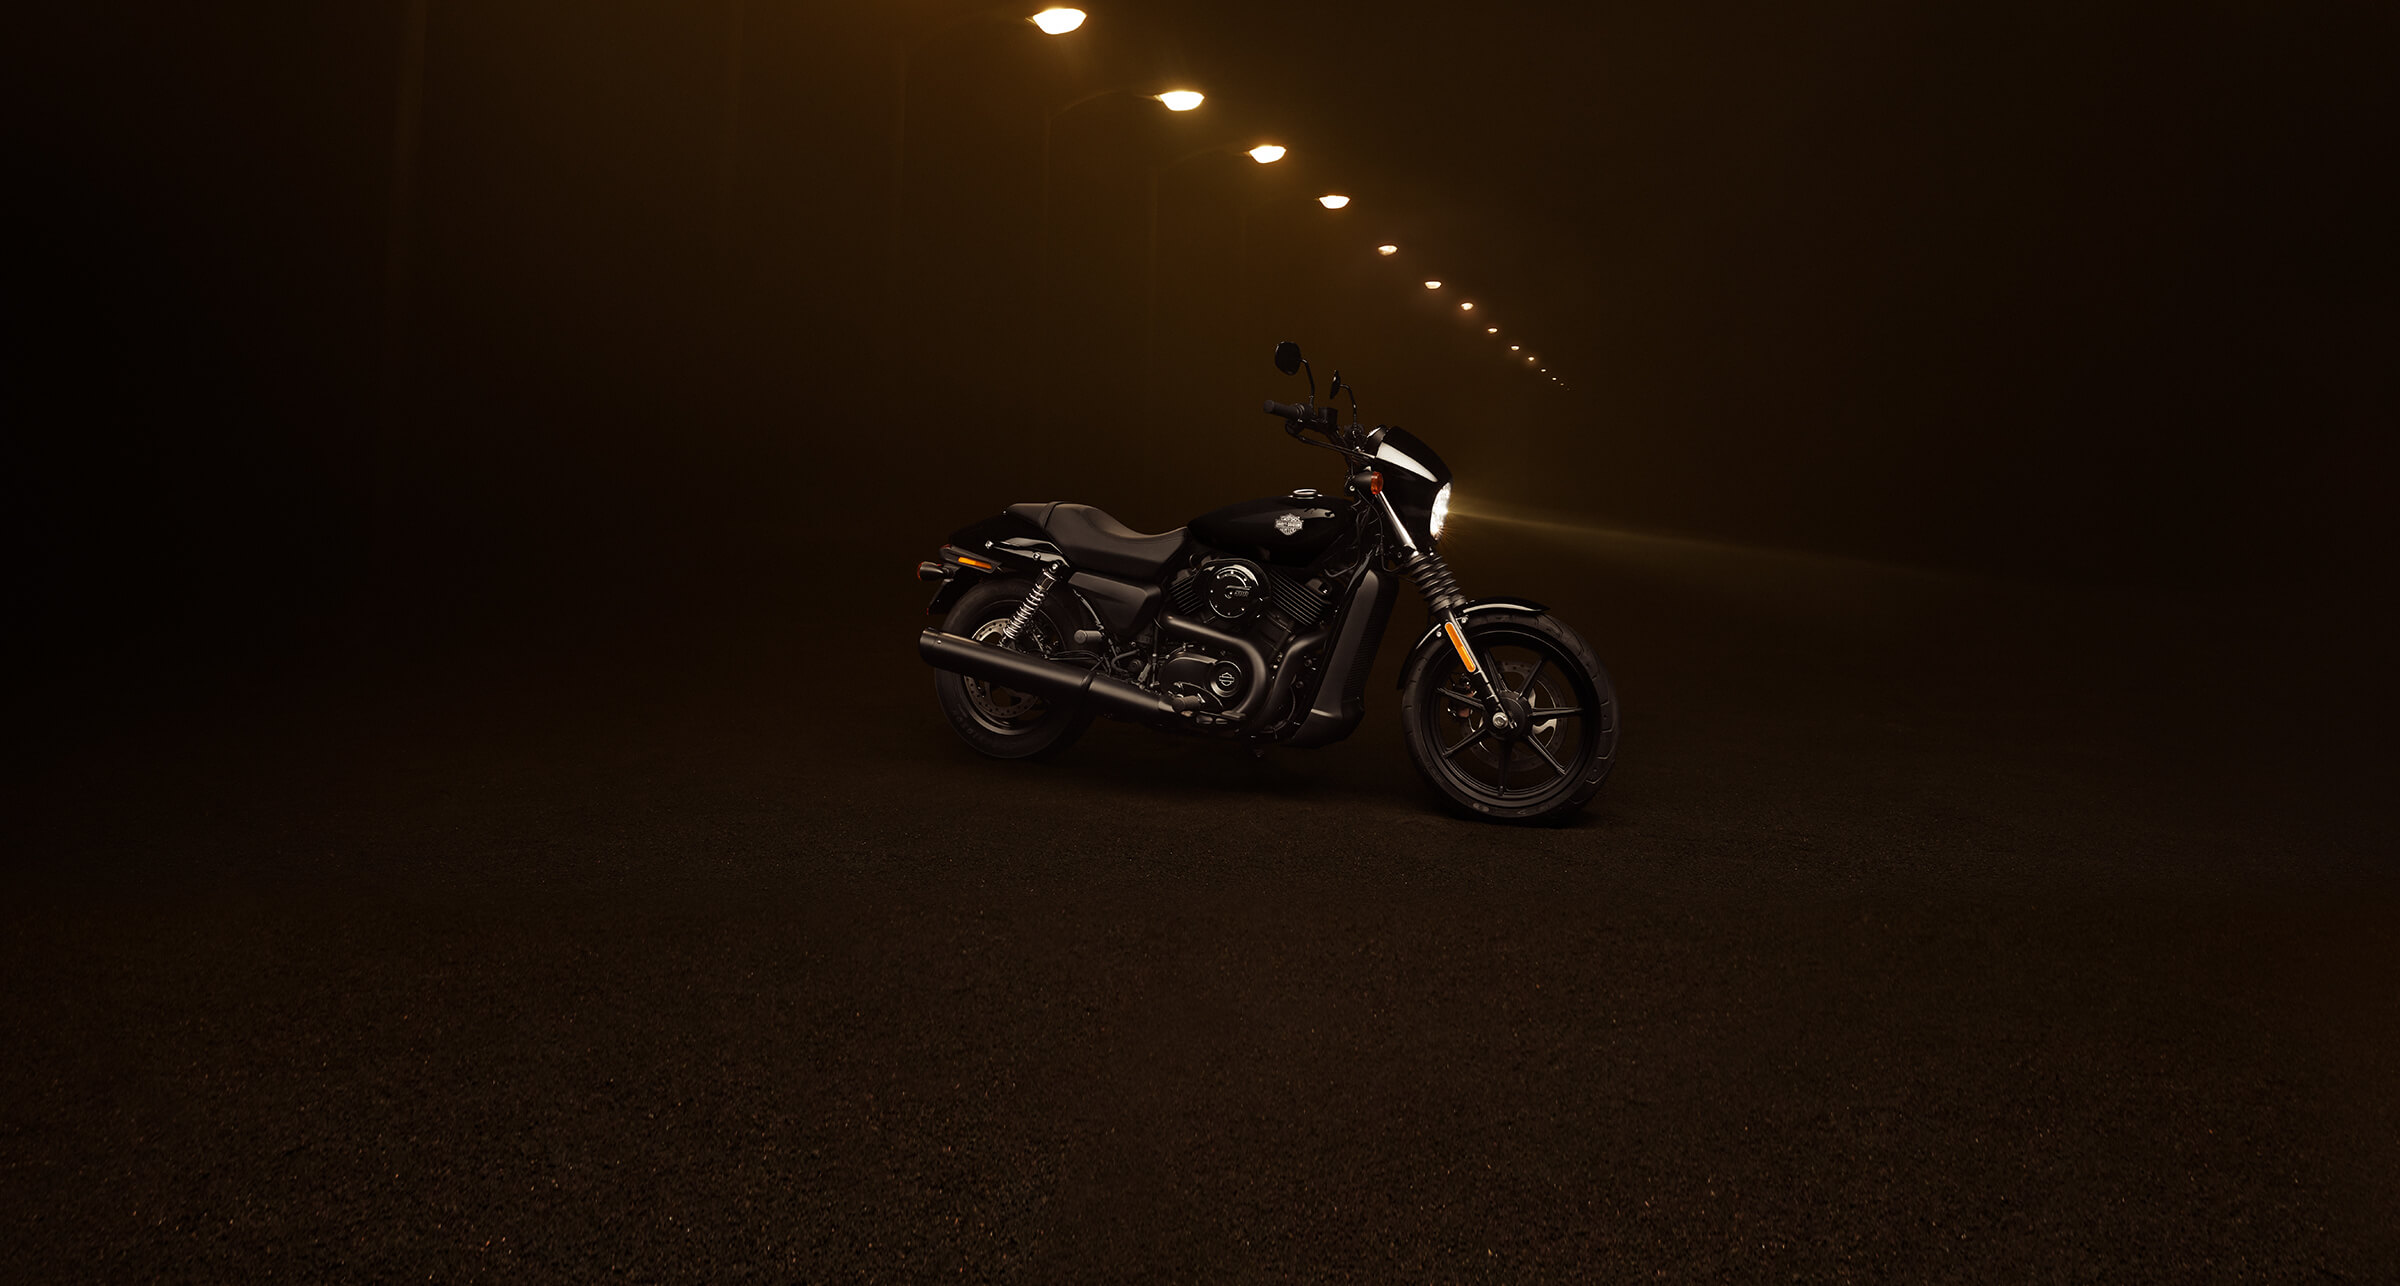 Street - 2020 Motorcycles